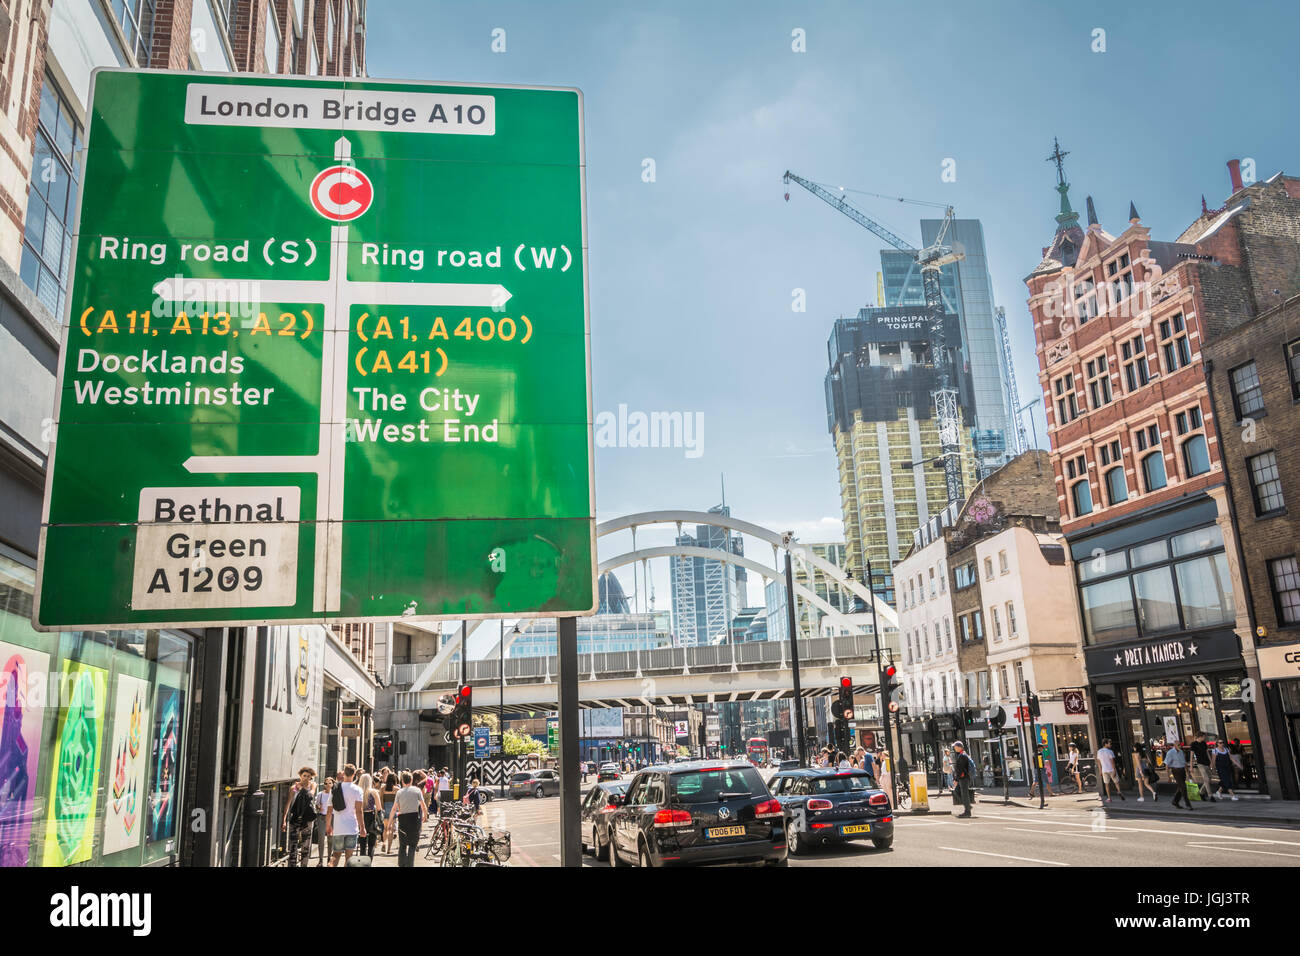 A street sign on Shoreditch High Street, London, UK - Stock Image